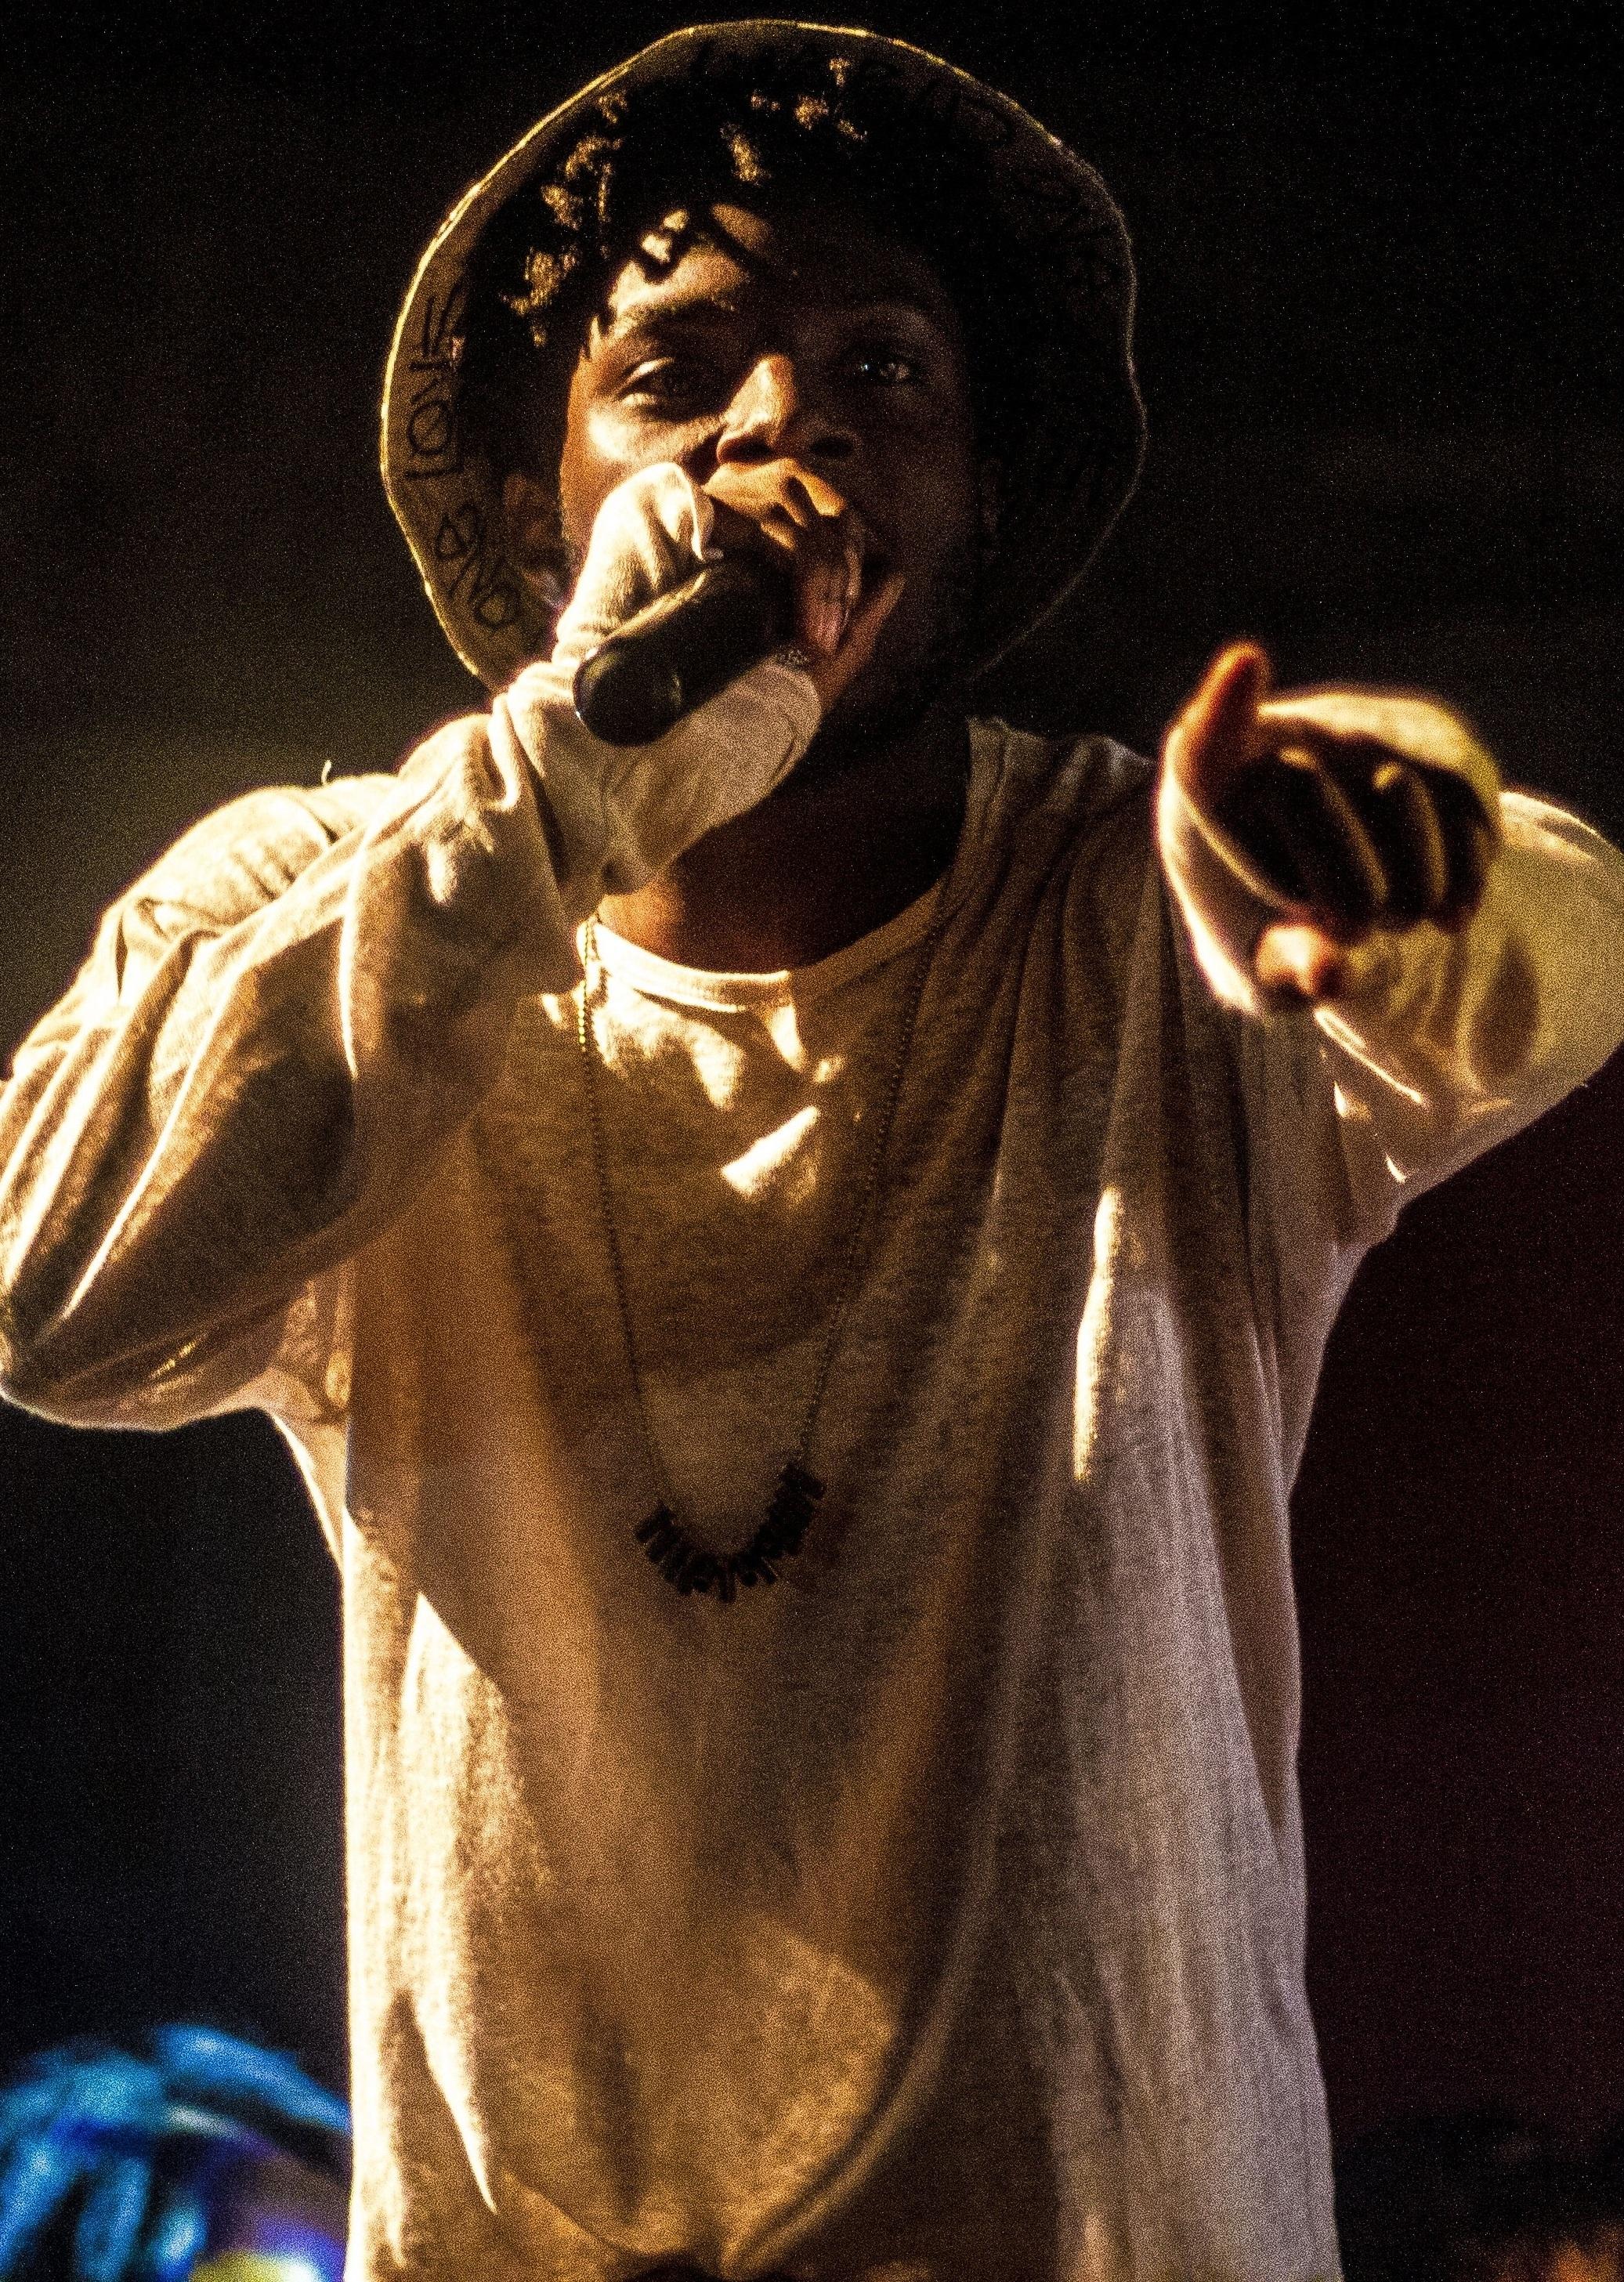 Isaiah Rashad discography - Wikipedia